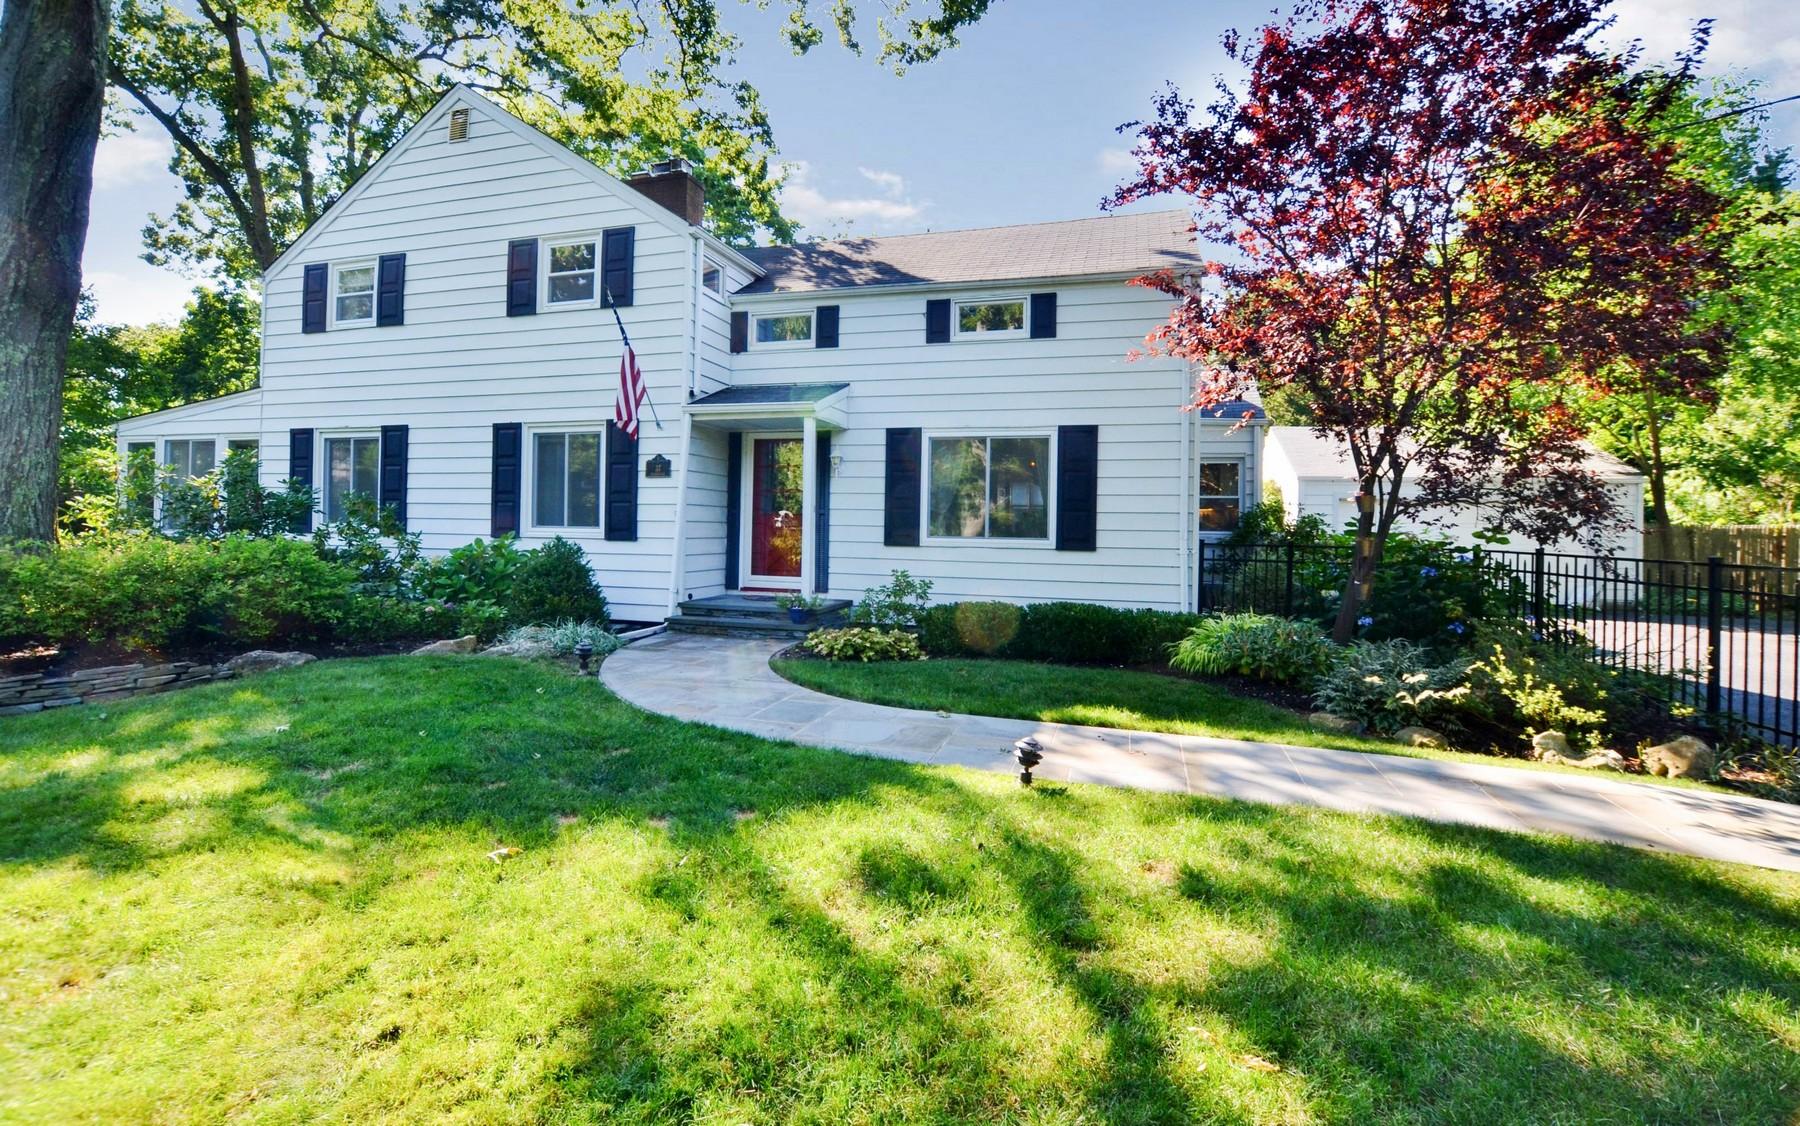 獨棟家庭住宅 為 出售 在 Colonial 37 Hildreth Ave Huntington, 紐約州, 11743 美國